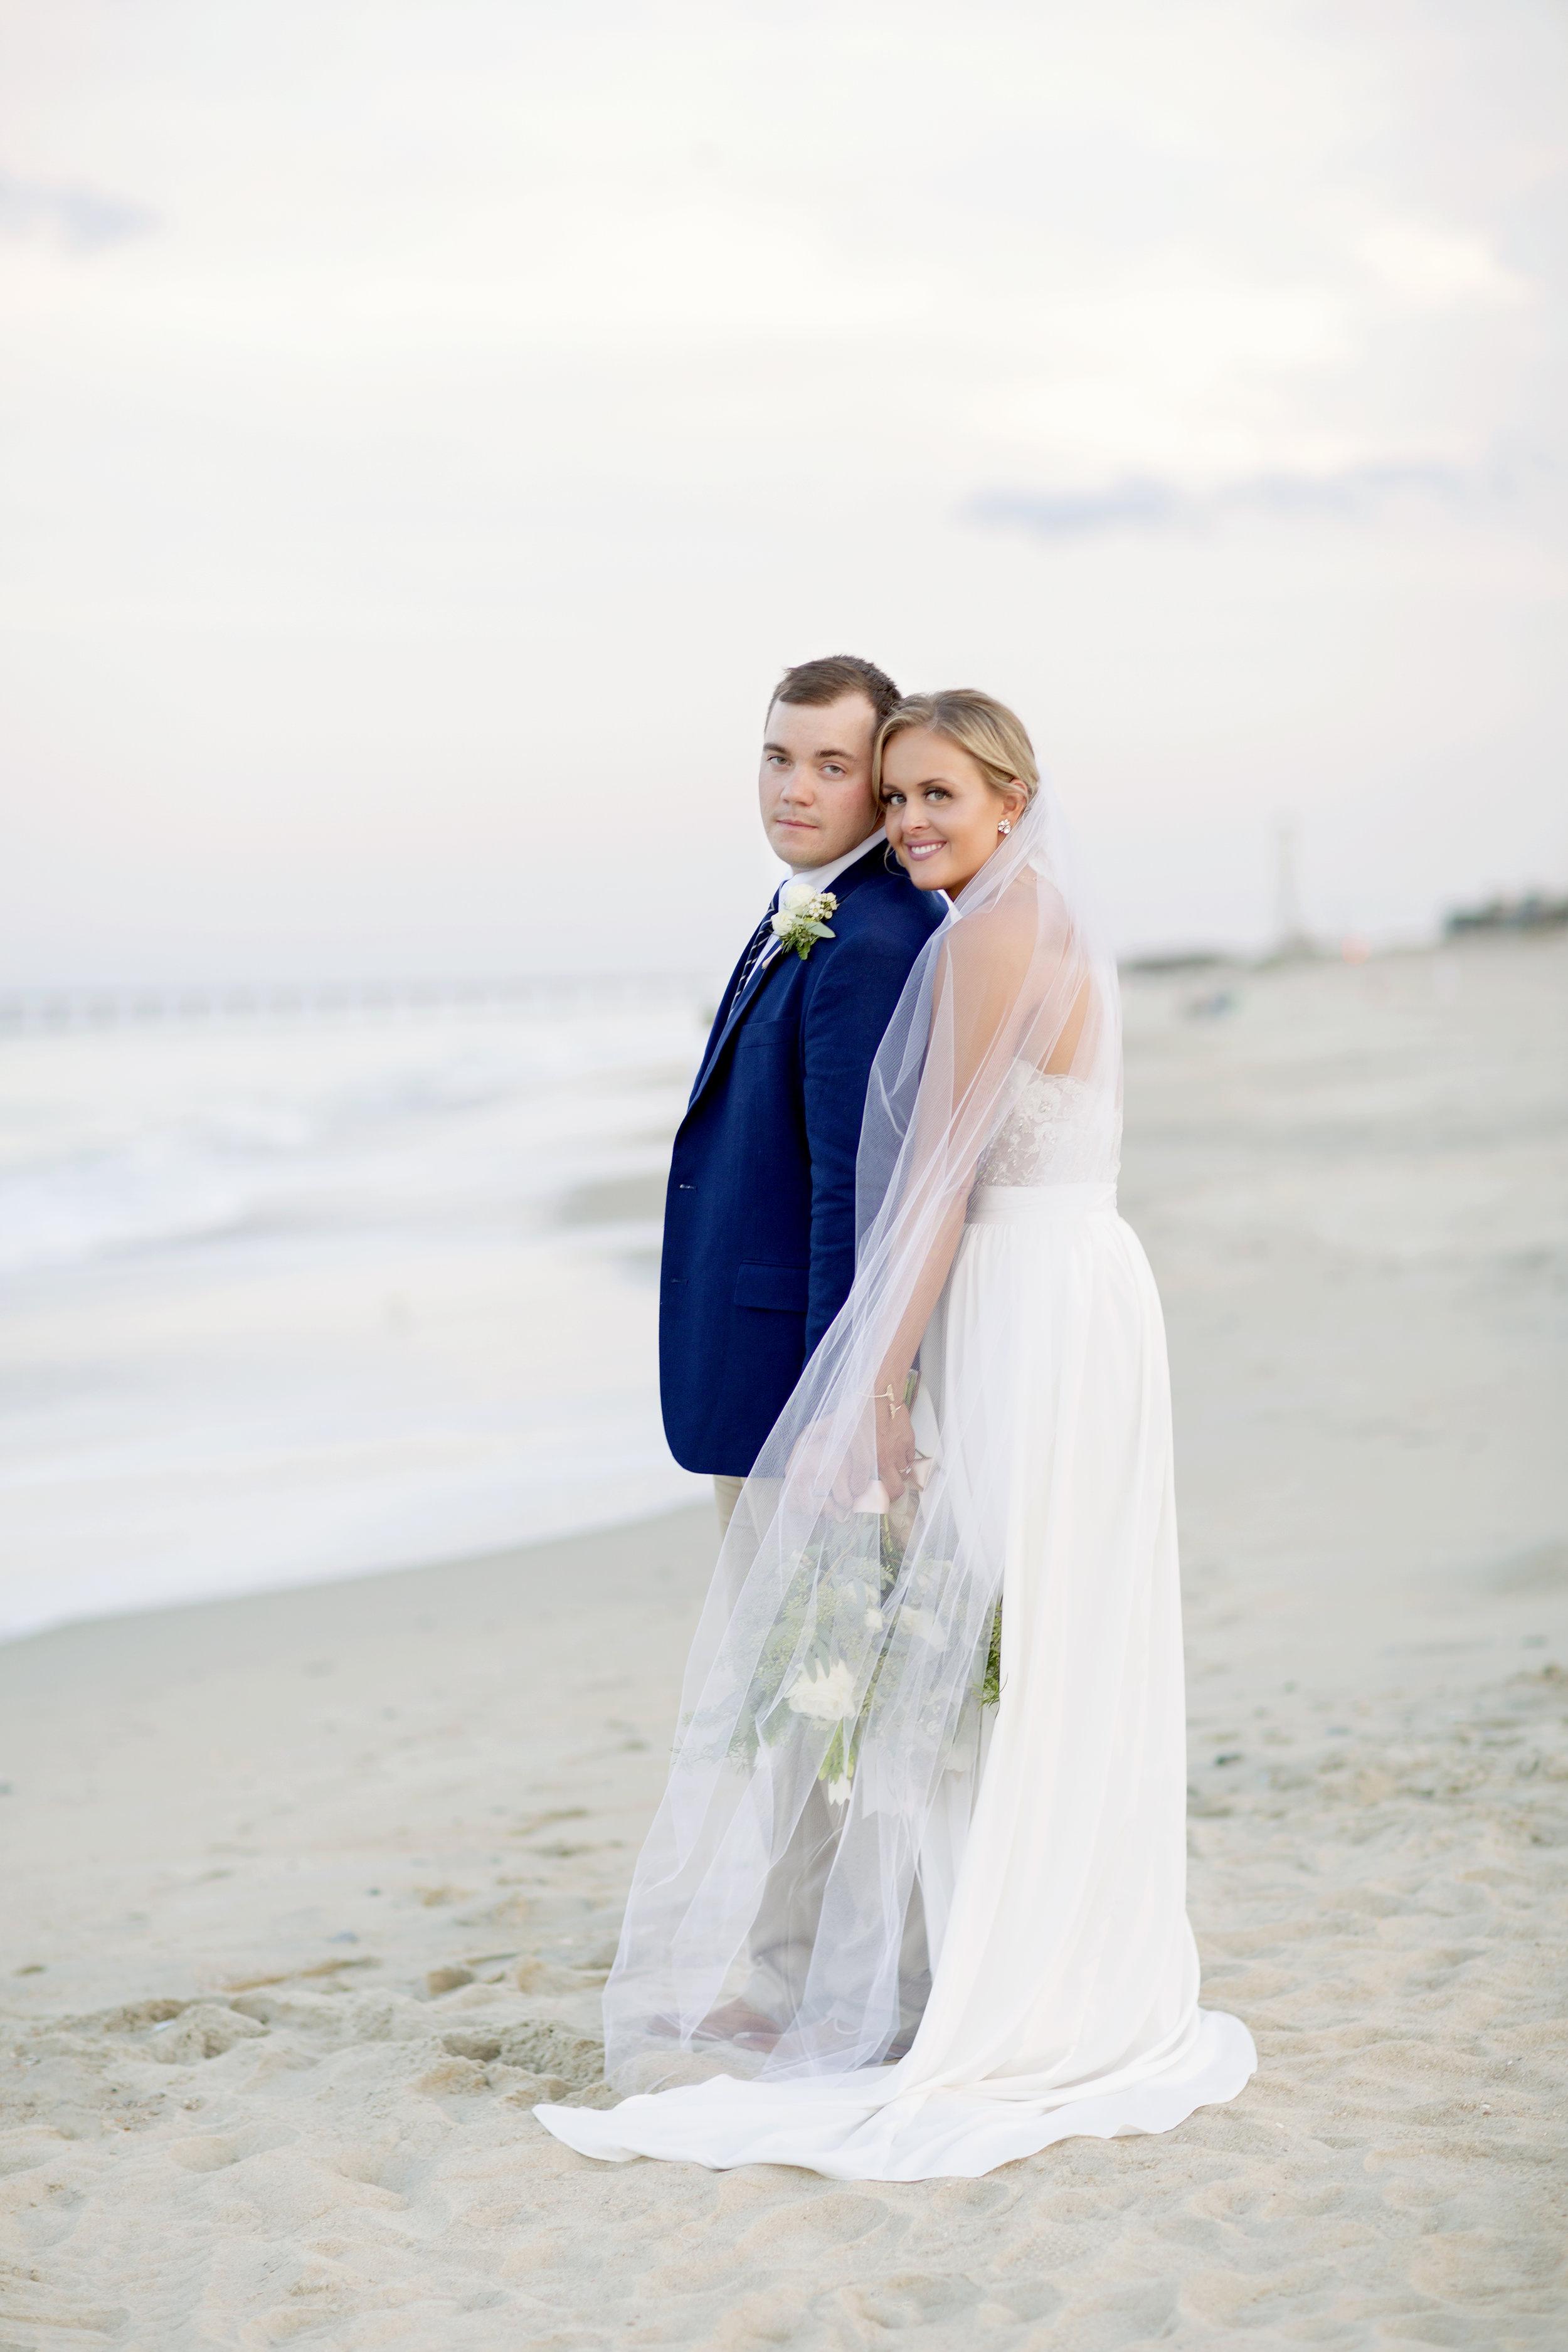 20170827_carroll_wedding_1702.jpg